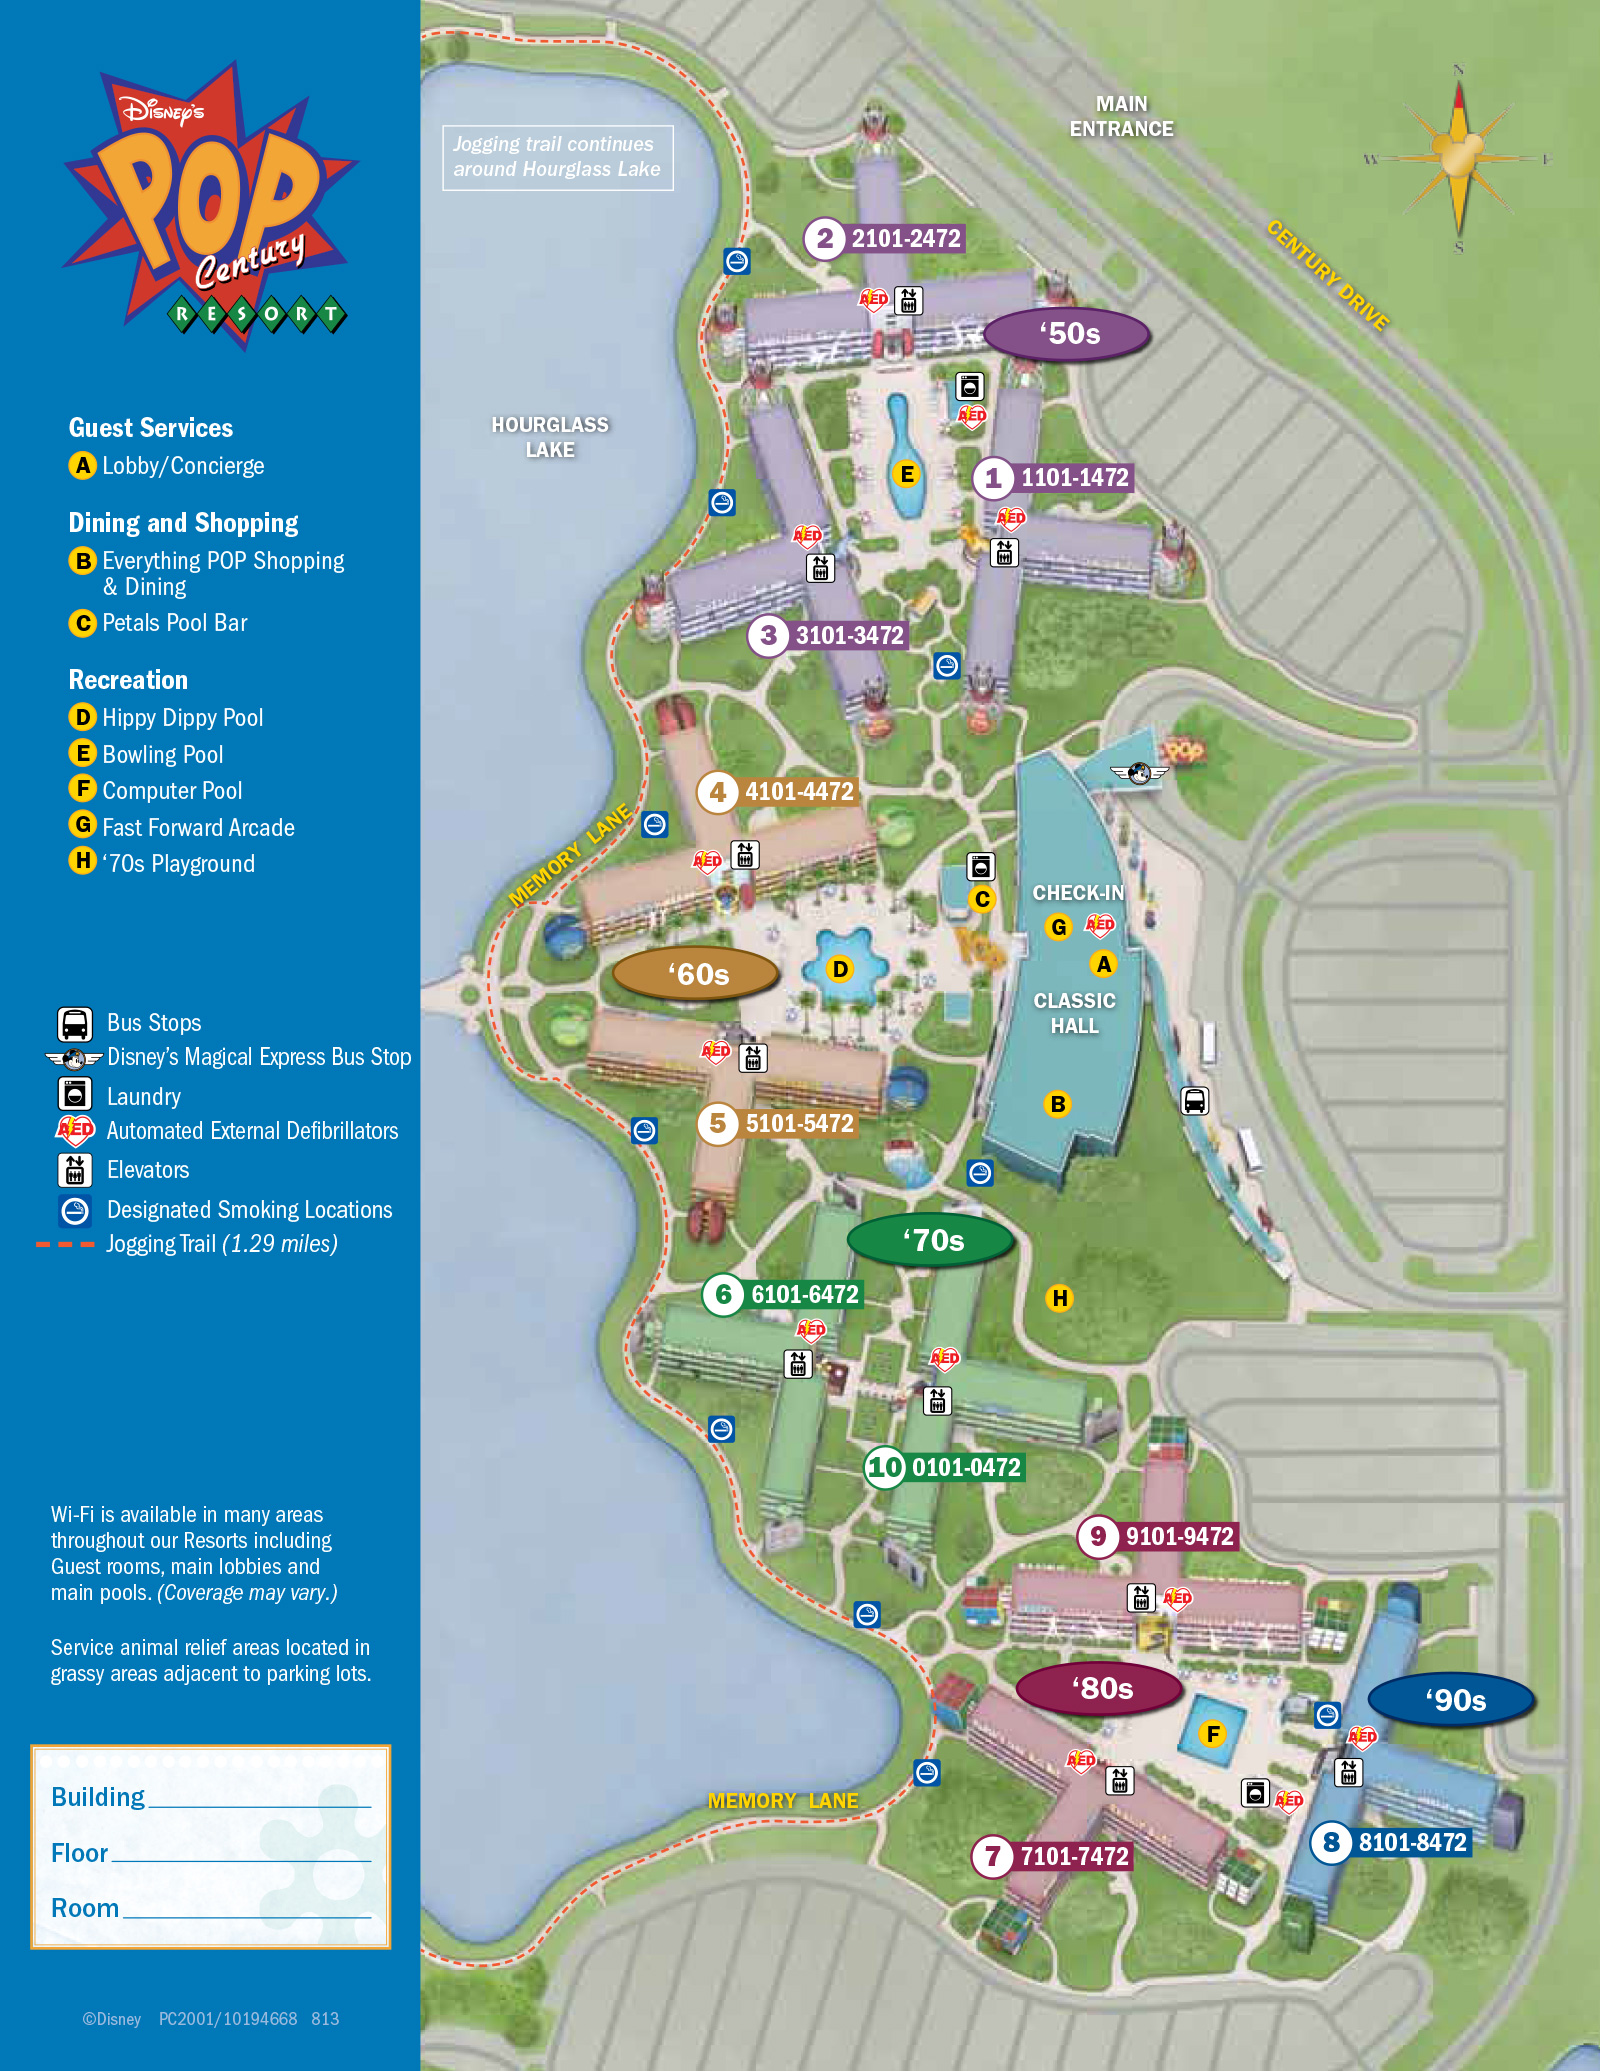 2013 Pop Century Resort guide map